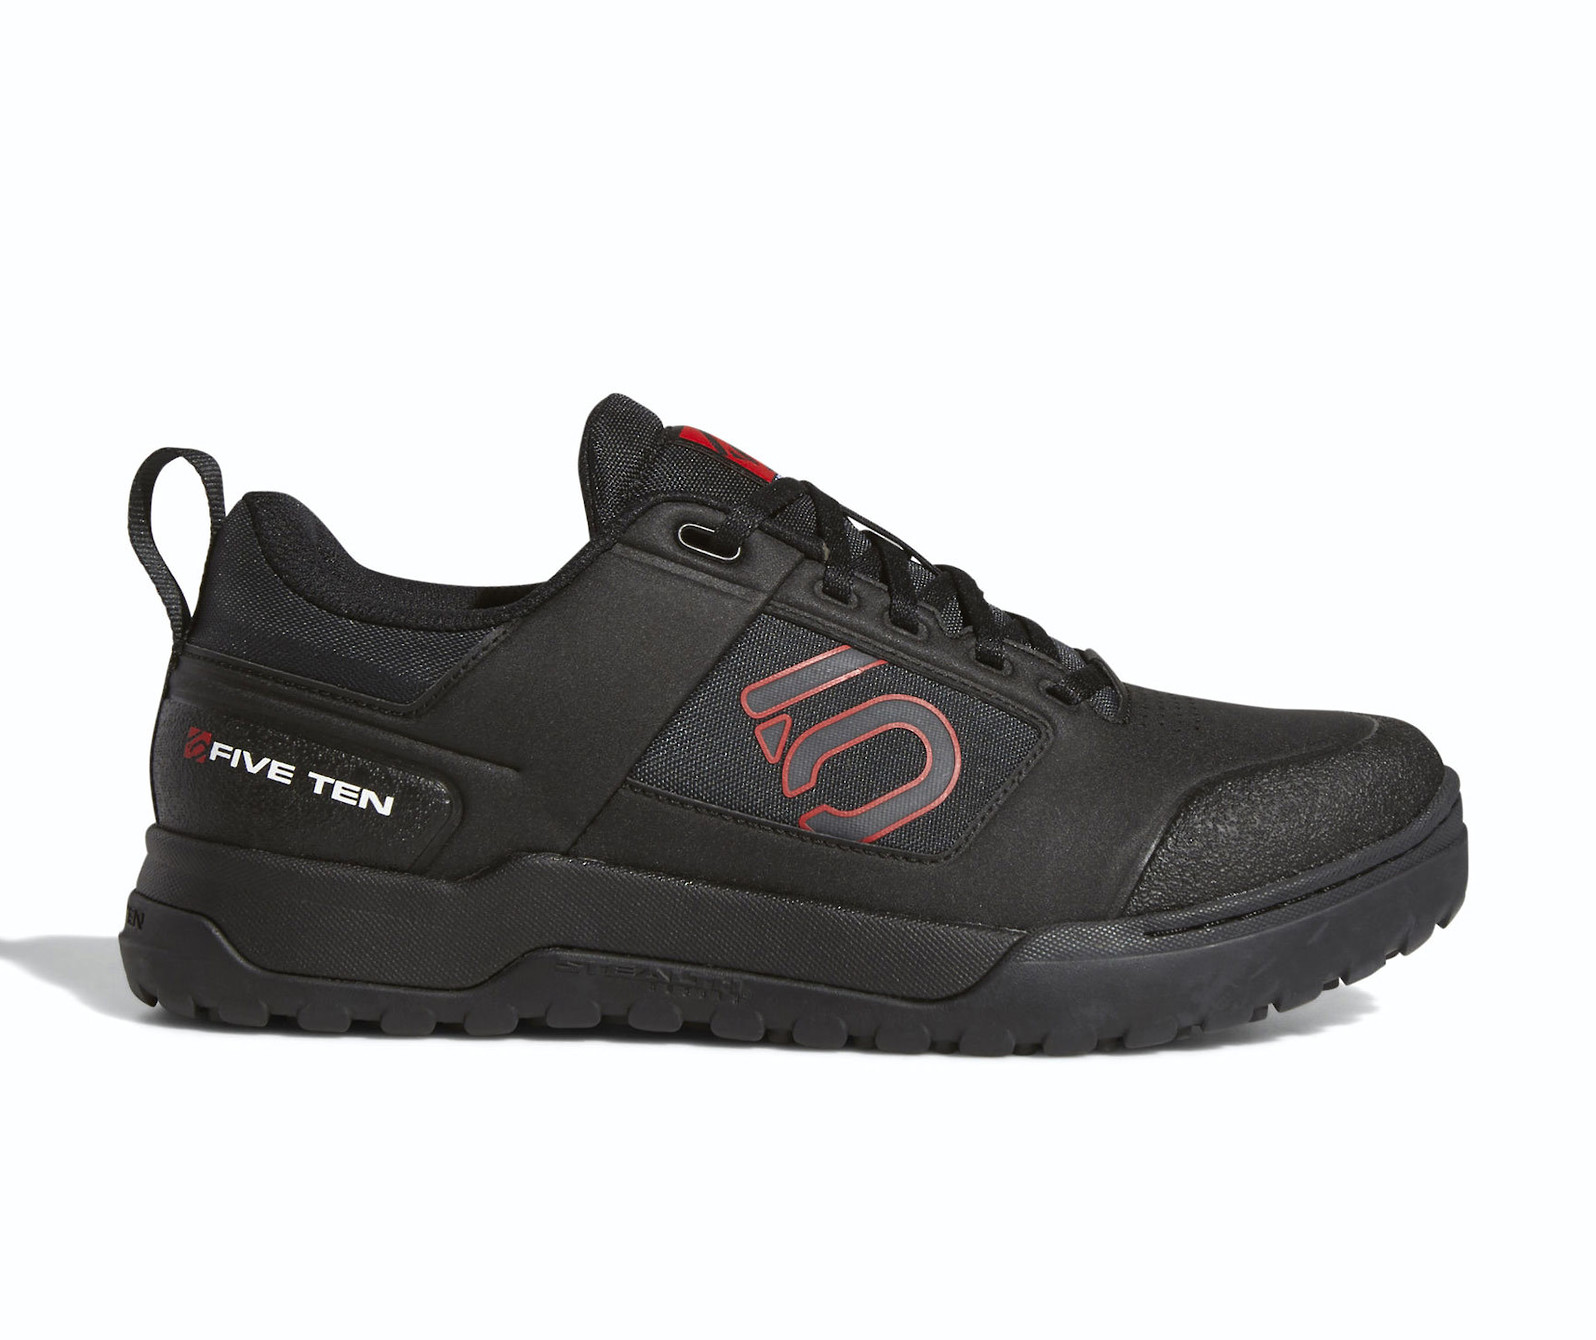 Five Ten 5.10 Freerider Pro Mens Flat Mountain Bike Shoe Navy White Size 6